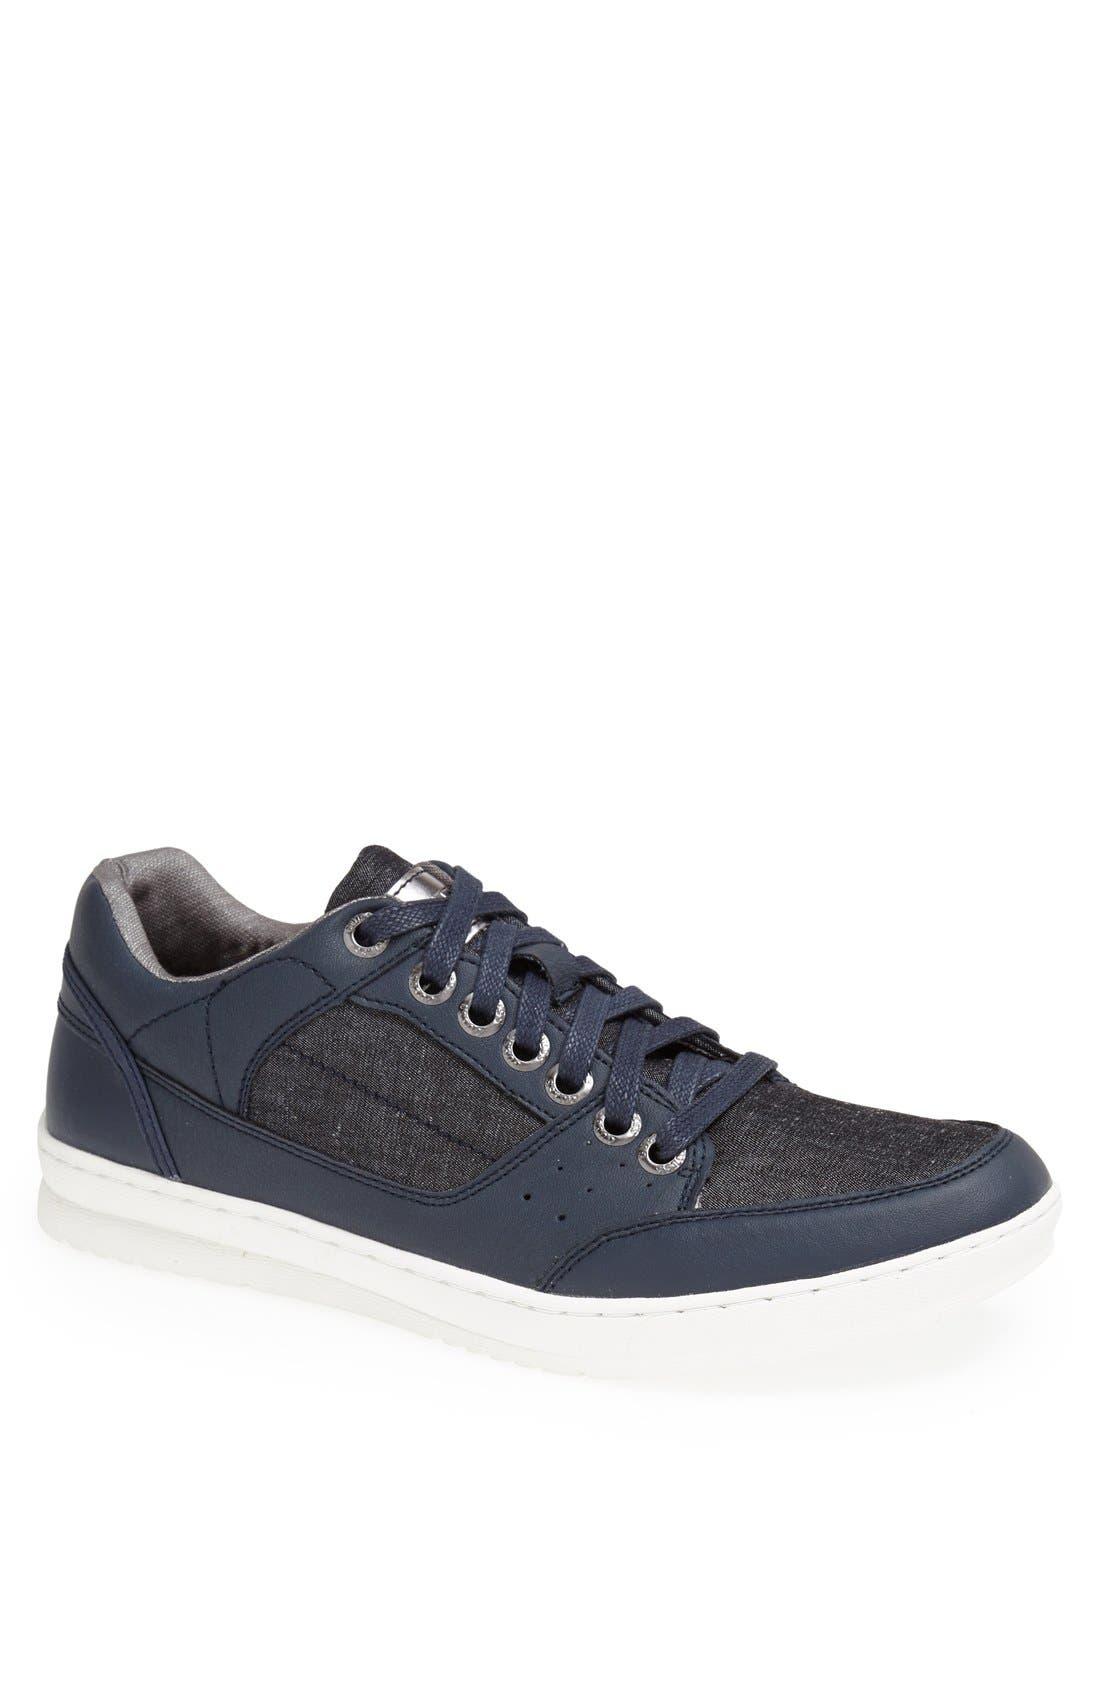 Alternate Image 1 Selected - GUESS 'Thurstan' Sneaker